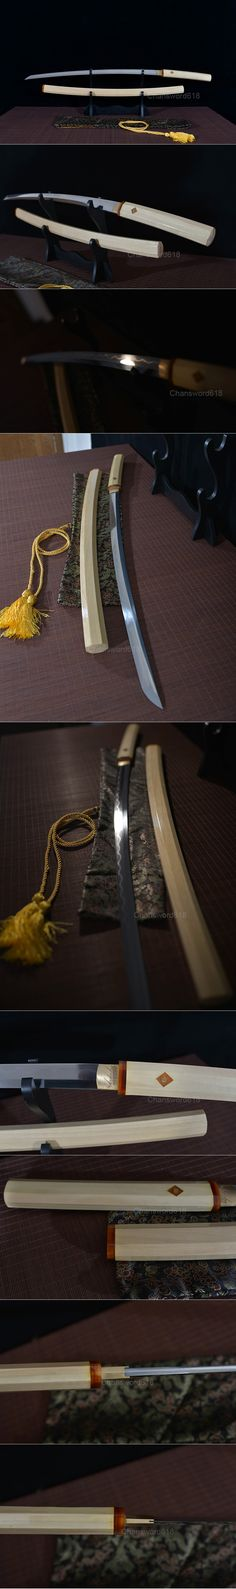 shirasaya Samurai Weapons, Katana Swords, Japanese Blades, Japanese Sword, Swords And Daggers, Knives And Swords, Sword Design, Cold Steel, Sword Art